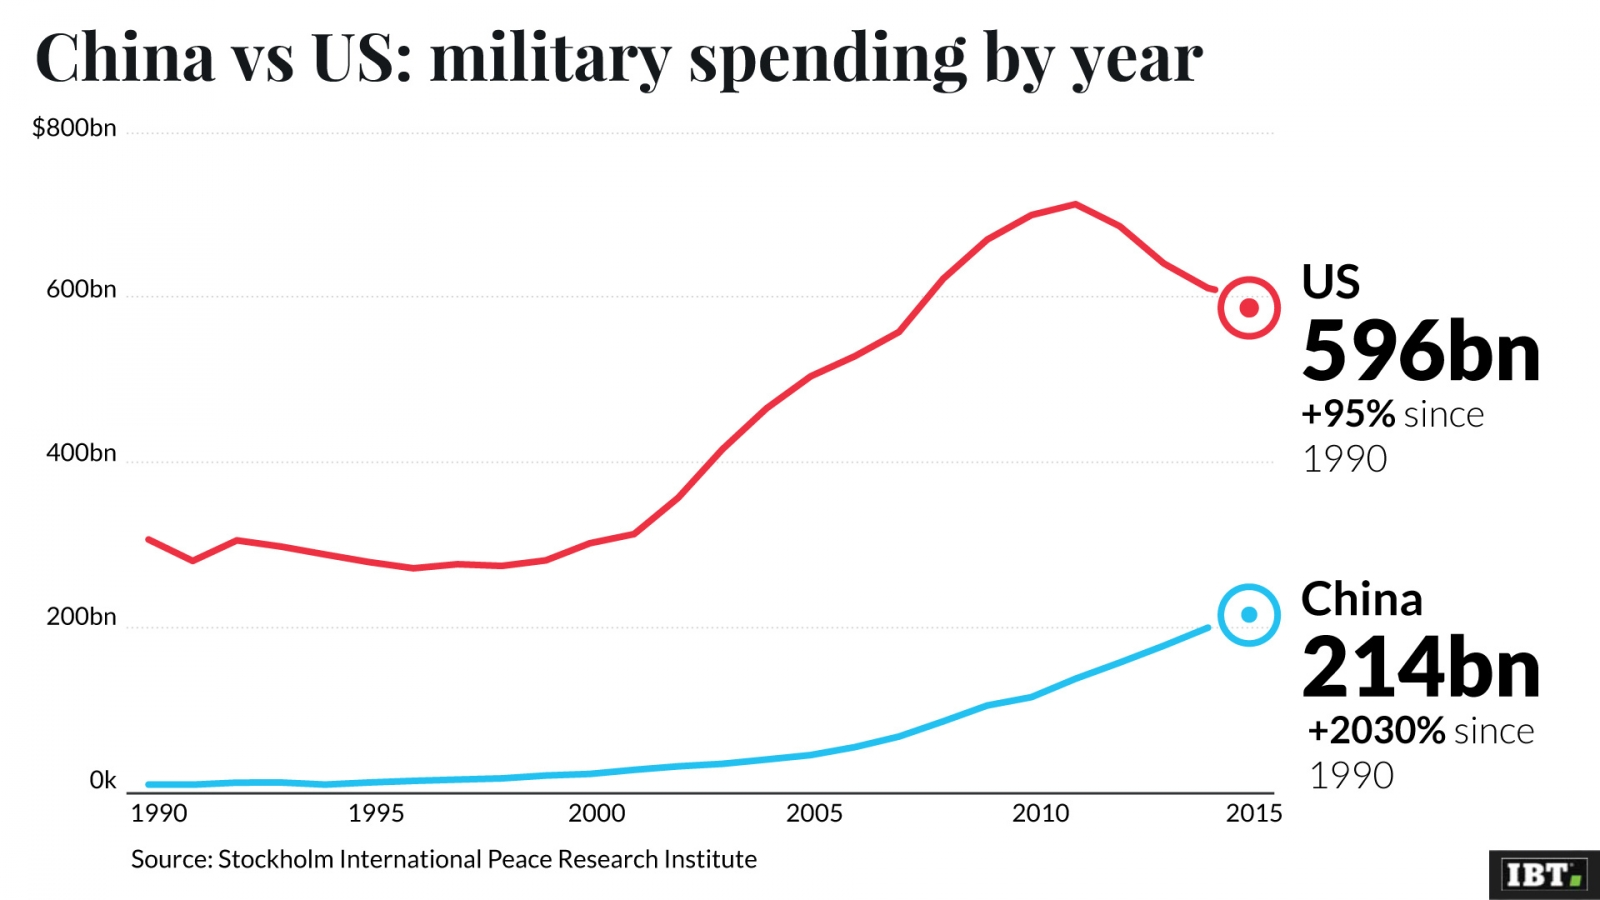 China vs US military spending